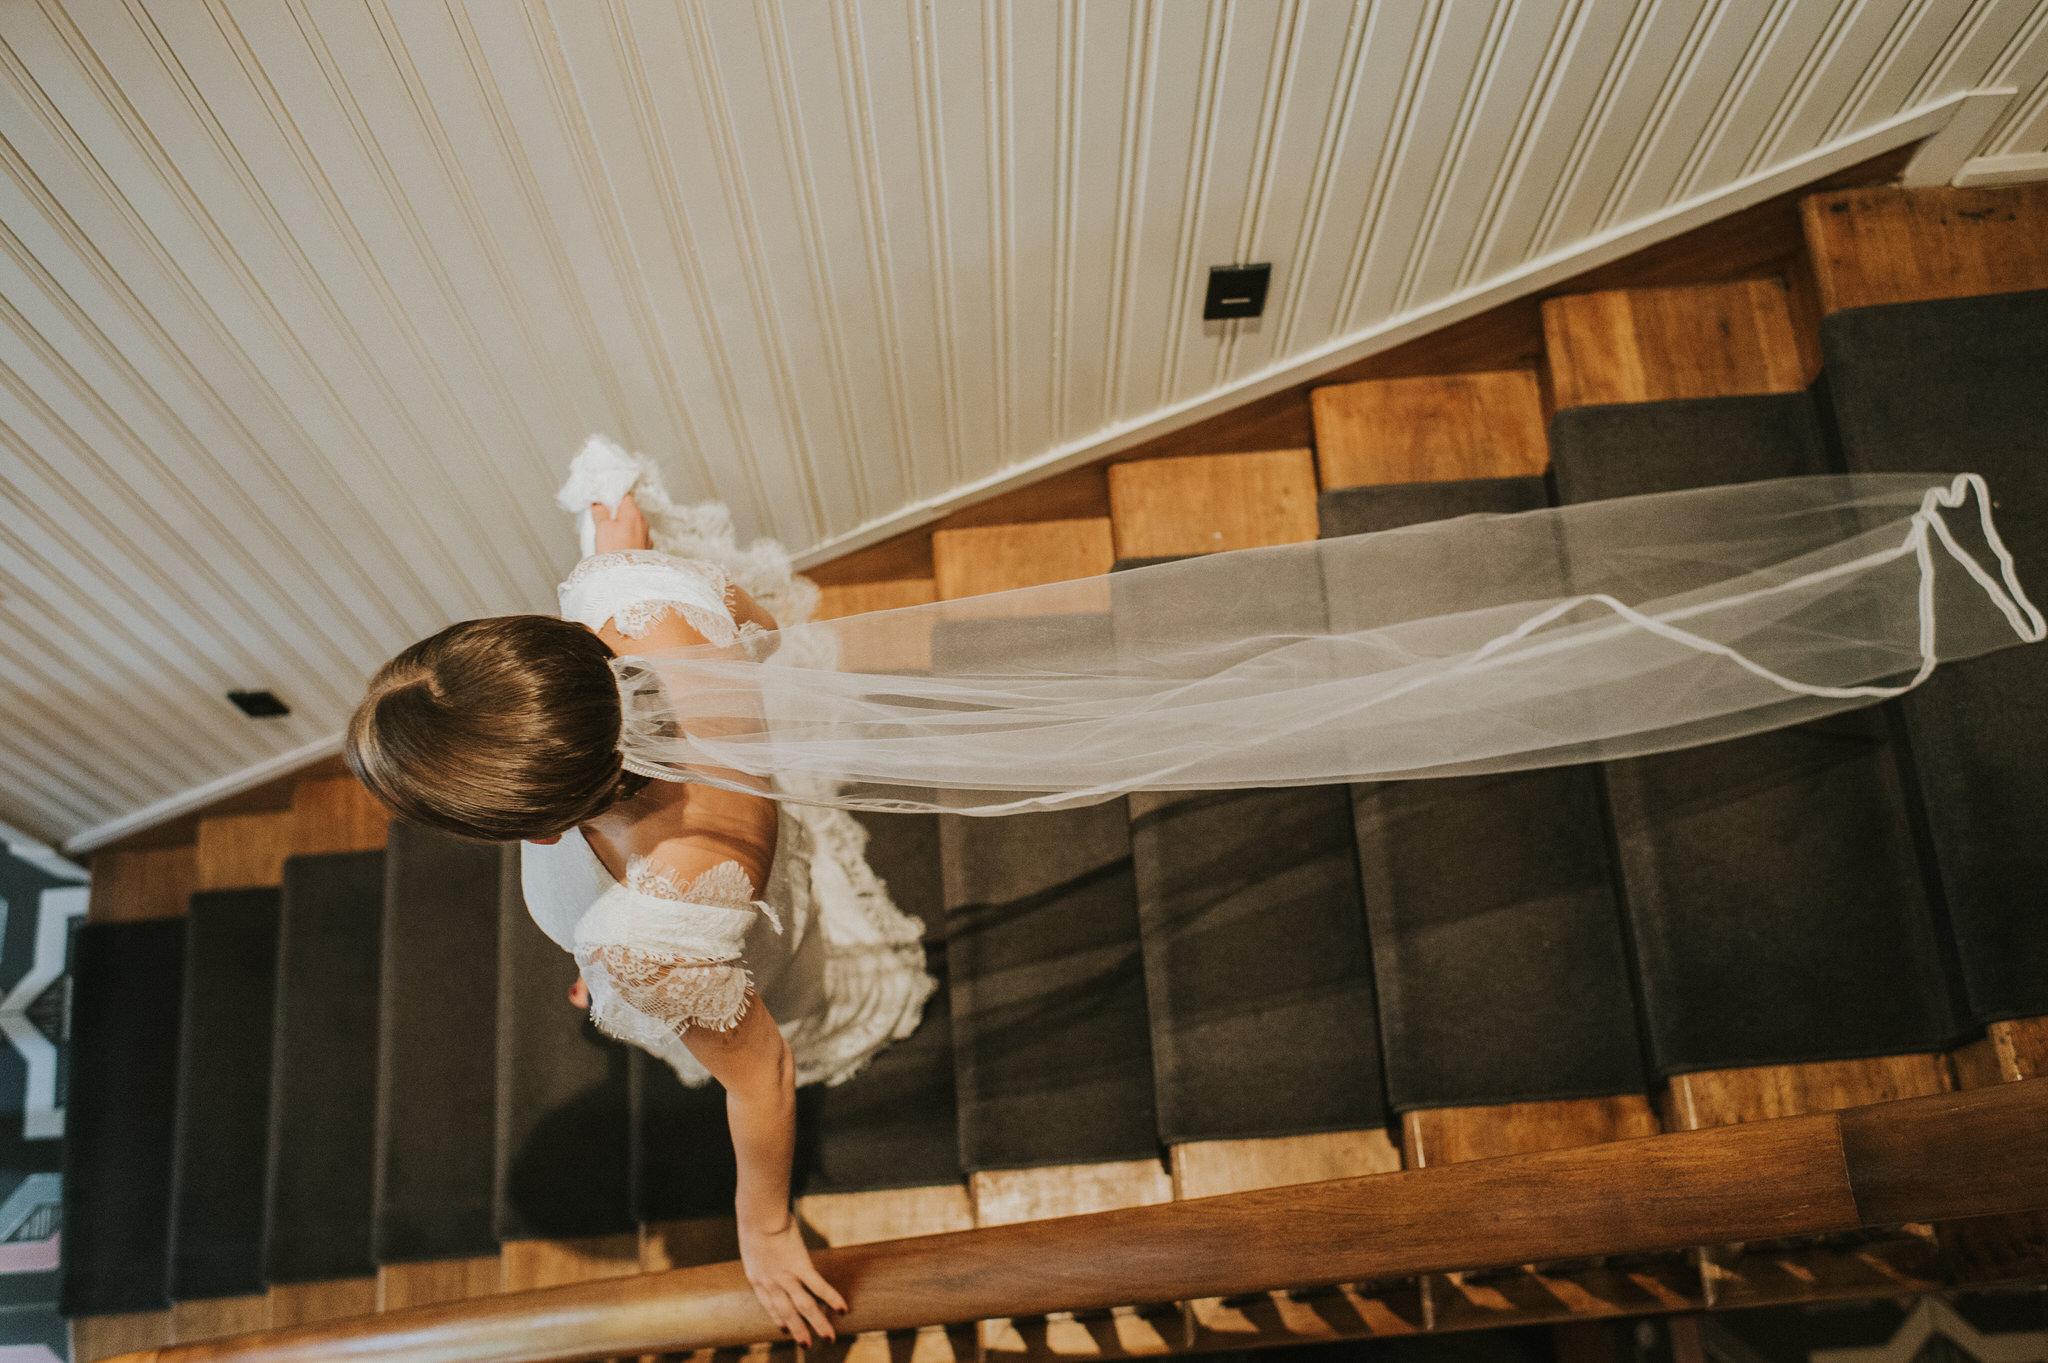 scarletoneillphotography_weddingphotography_prince edward county weddings031.JPG